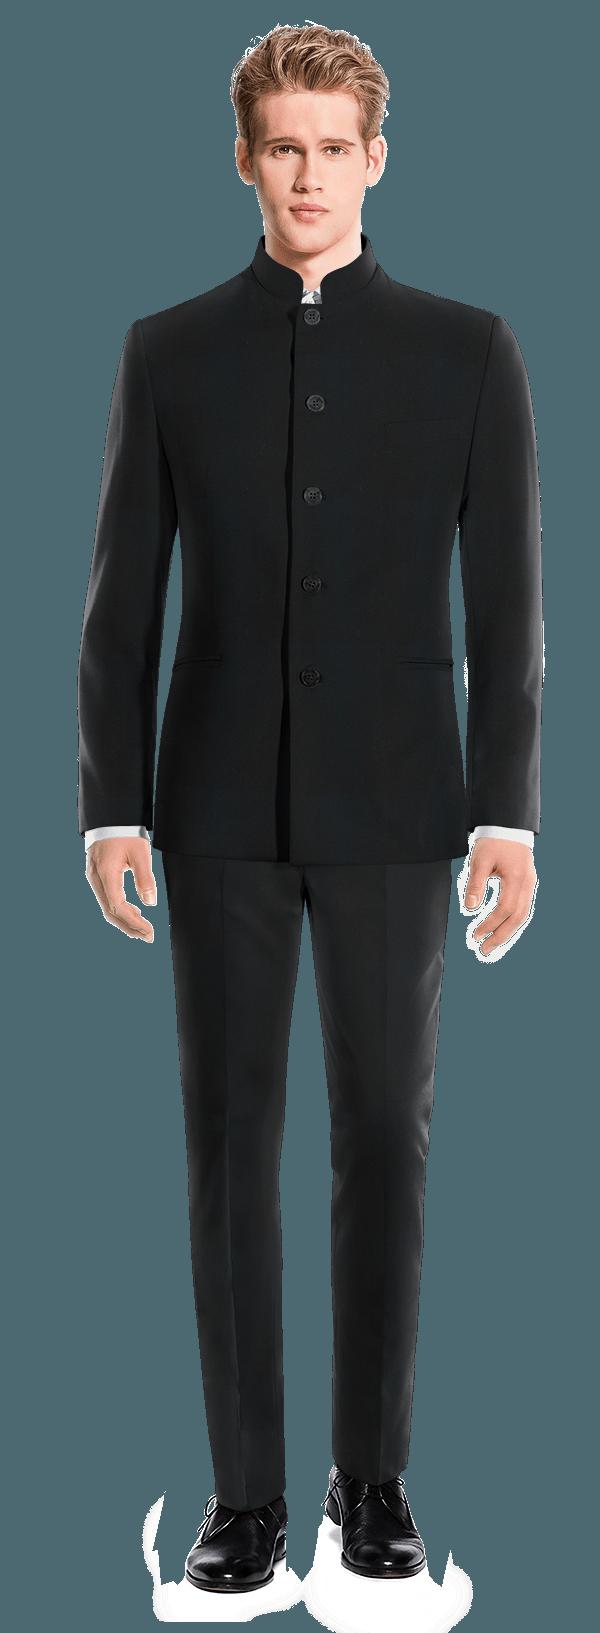 Black Mao 100% Wool Suit